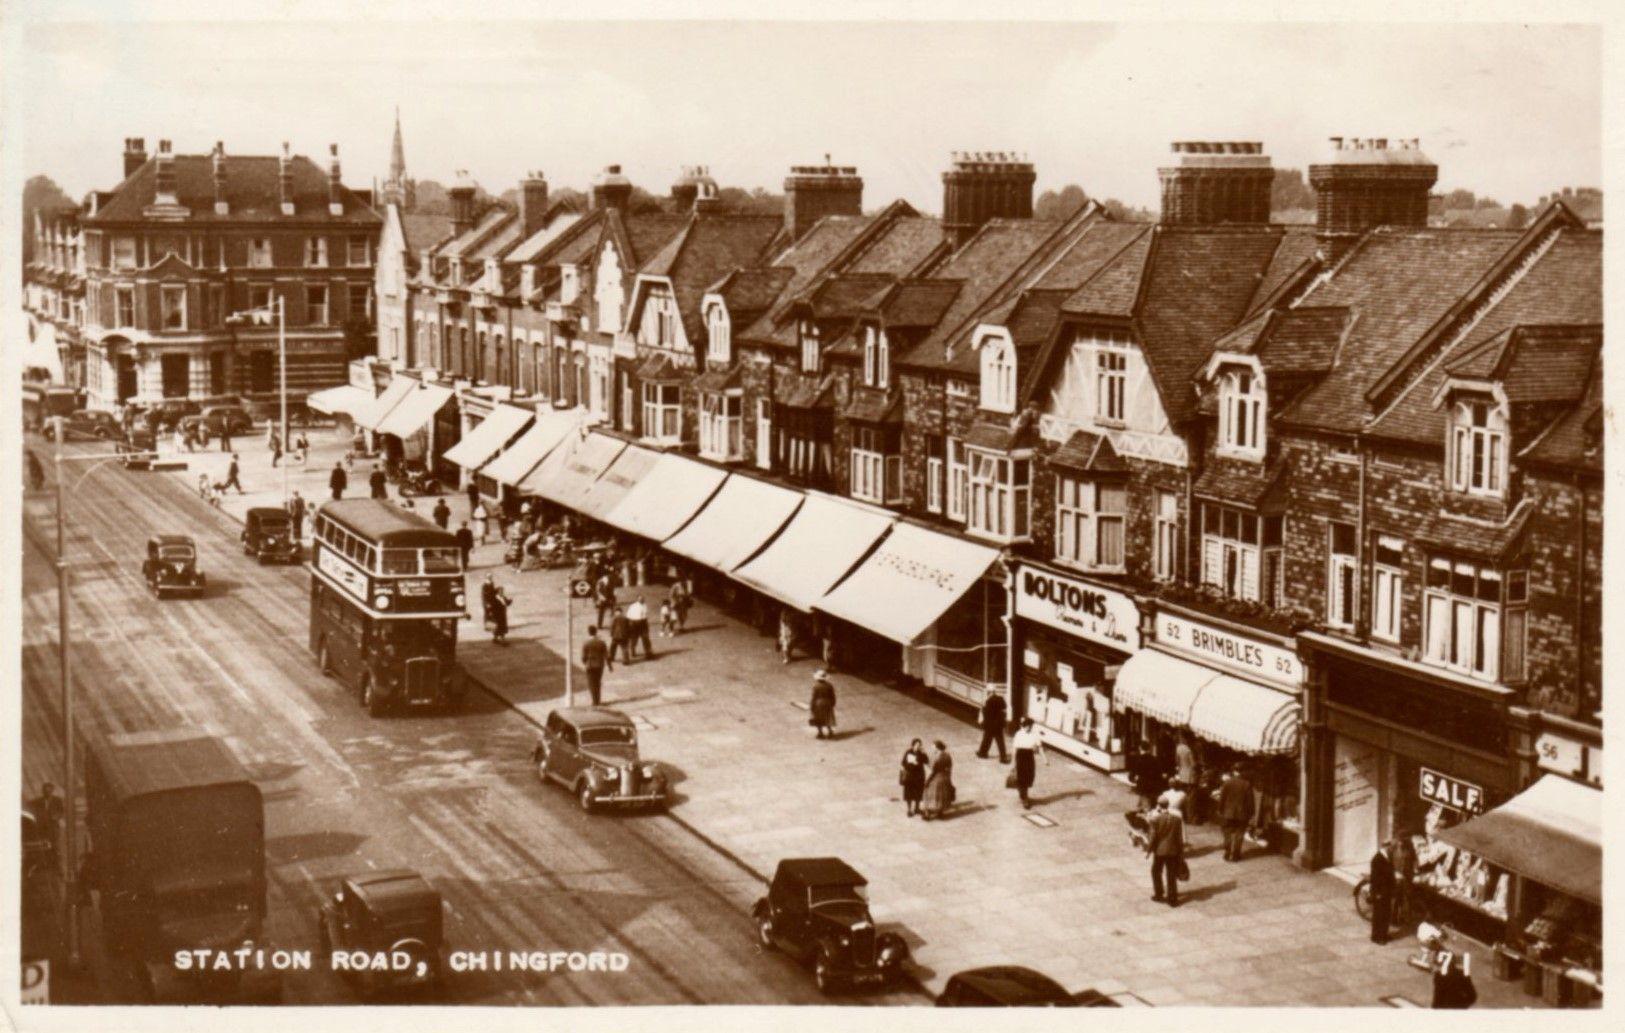 Station Road Brimble 1940's